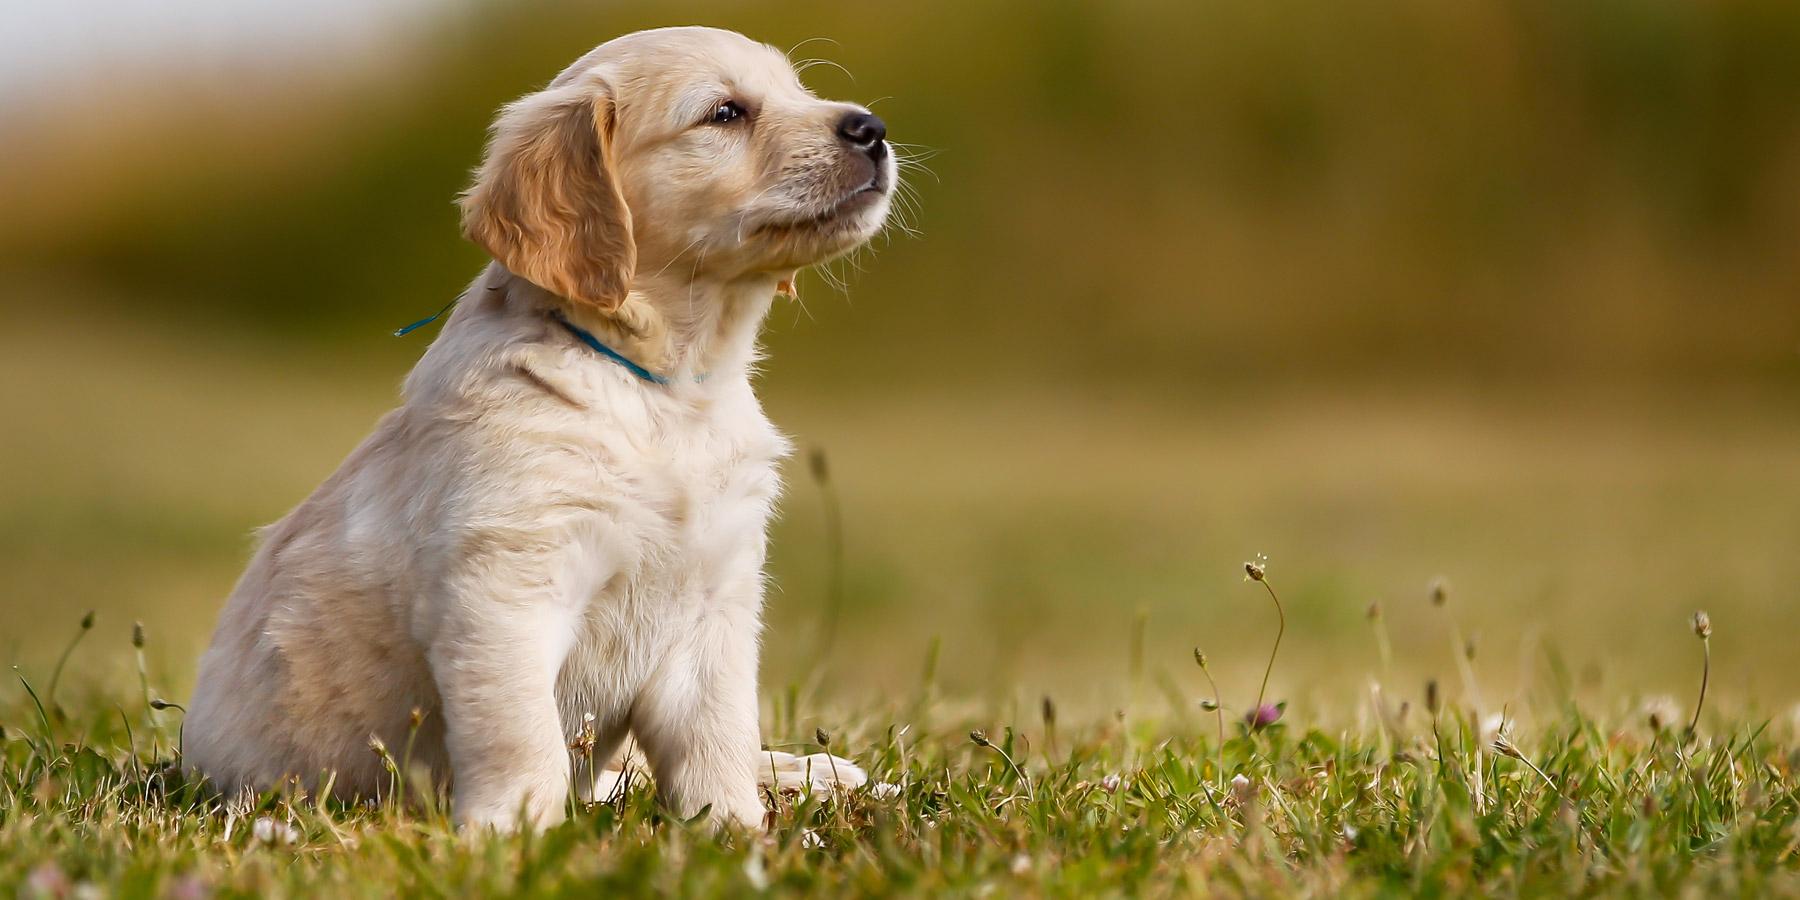 Puppy veterinarians